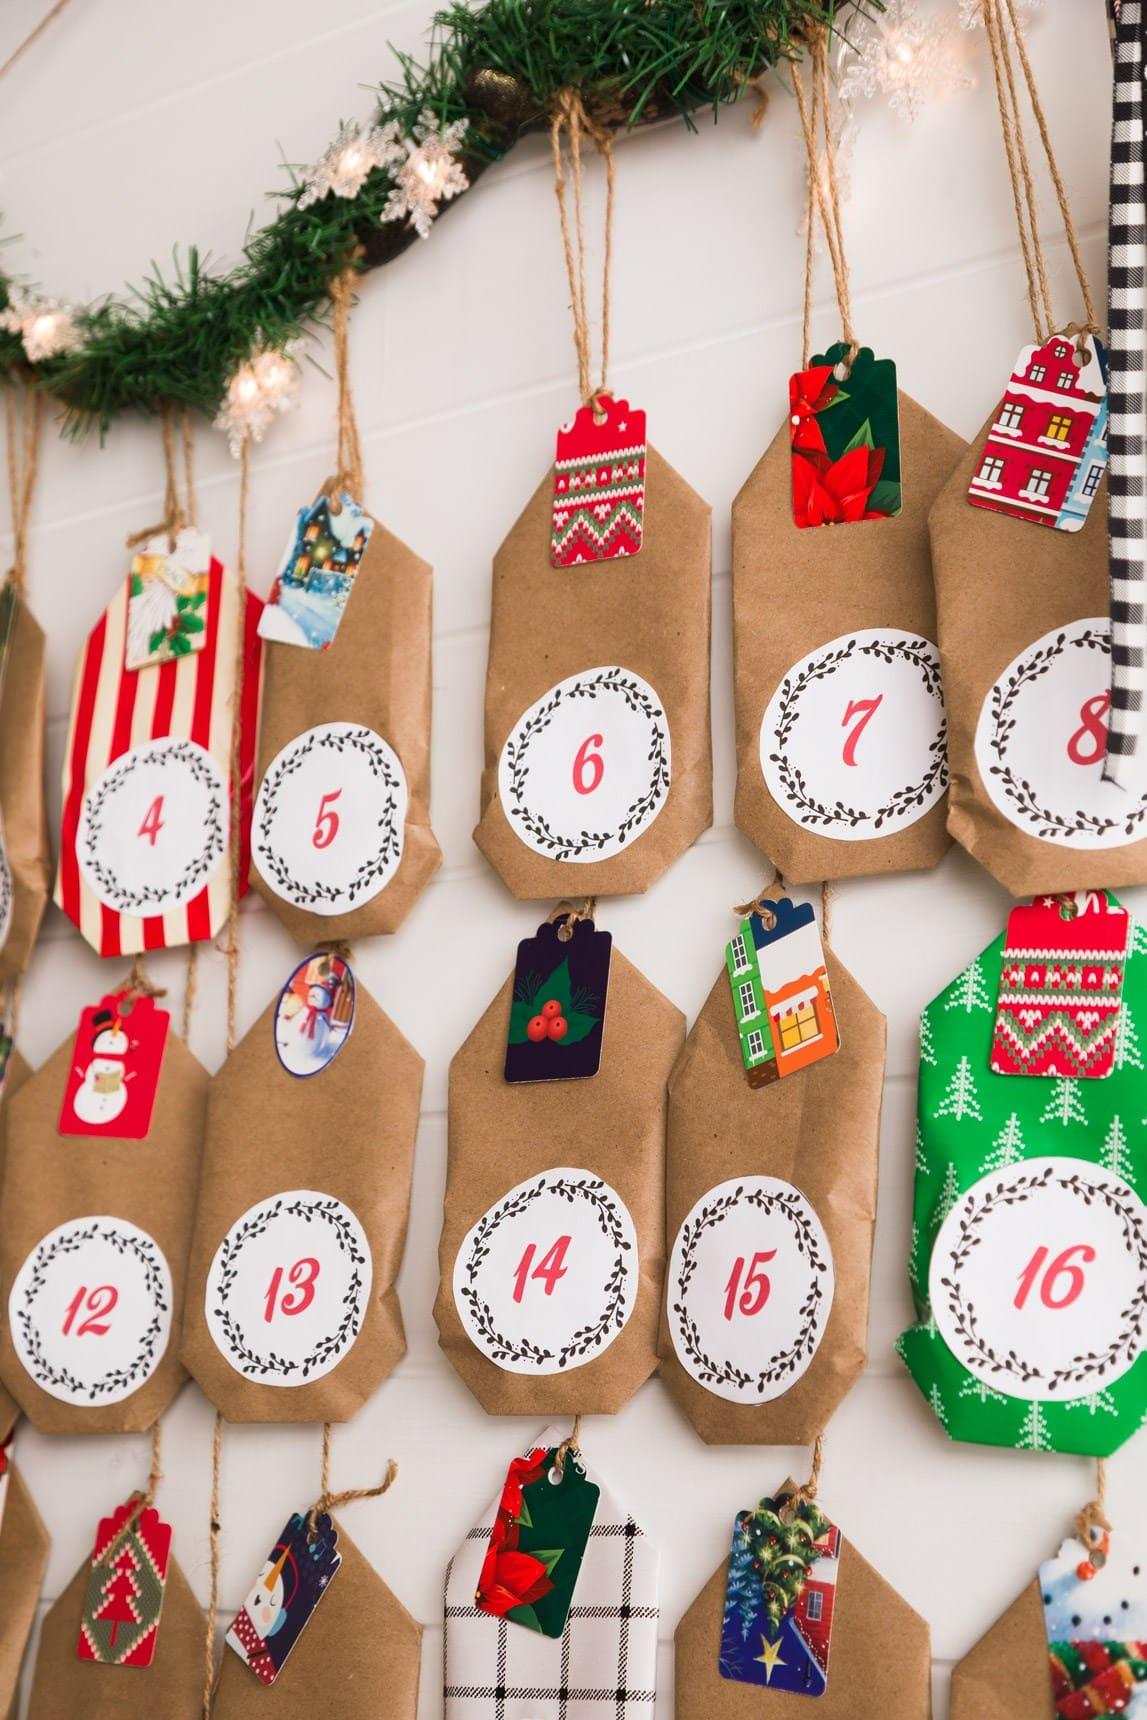 Kippi at Home Christmas card ideas